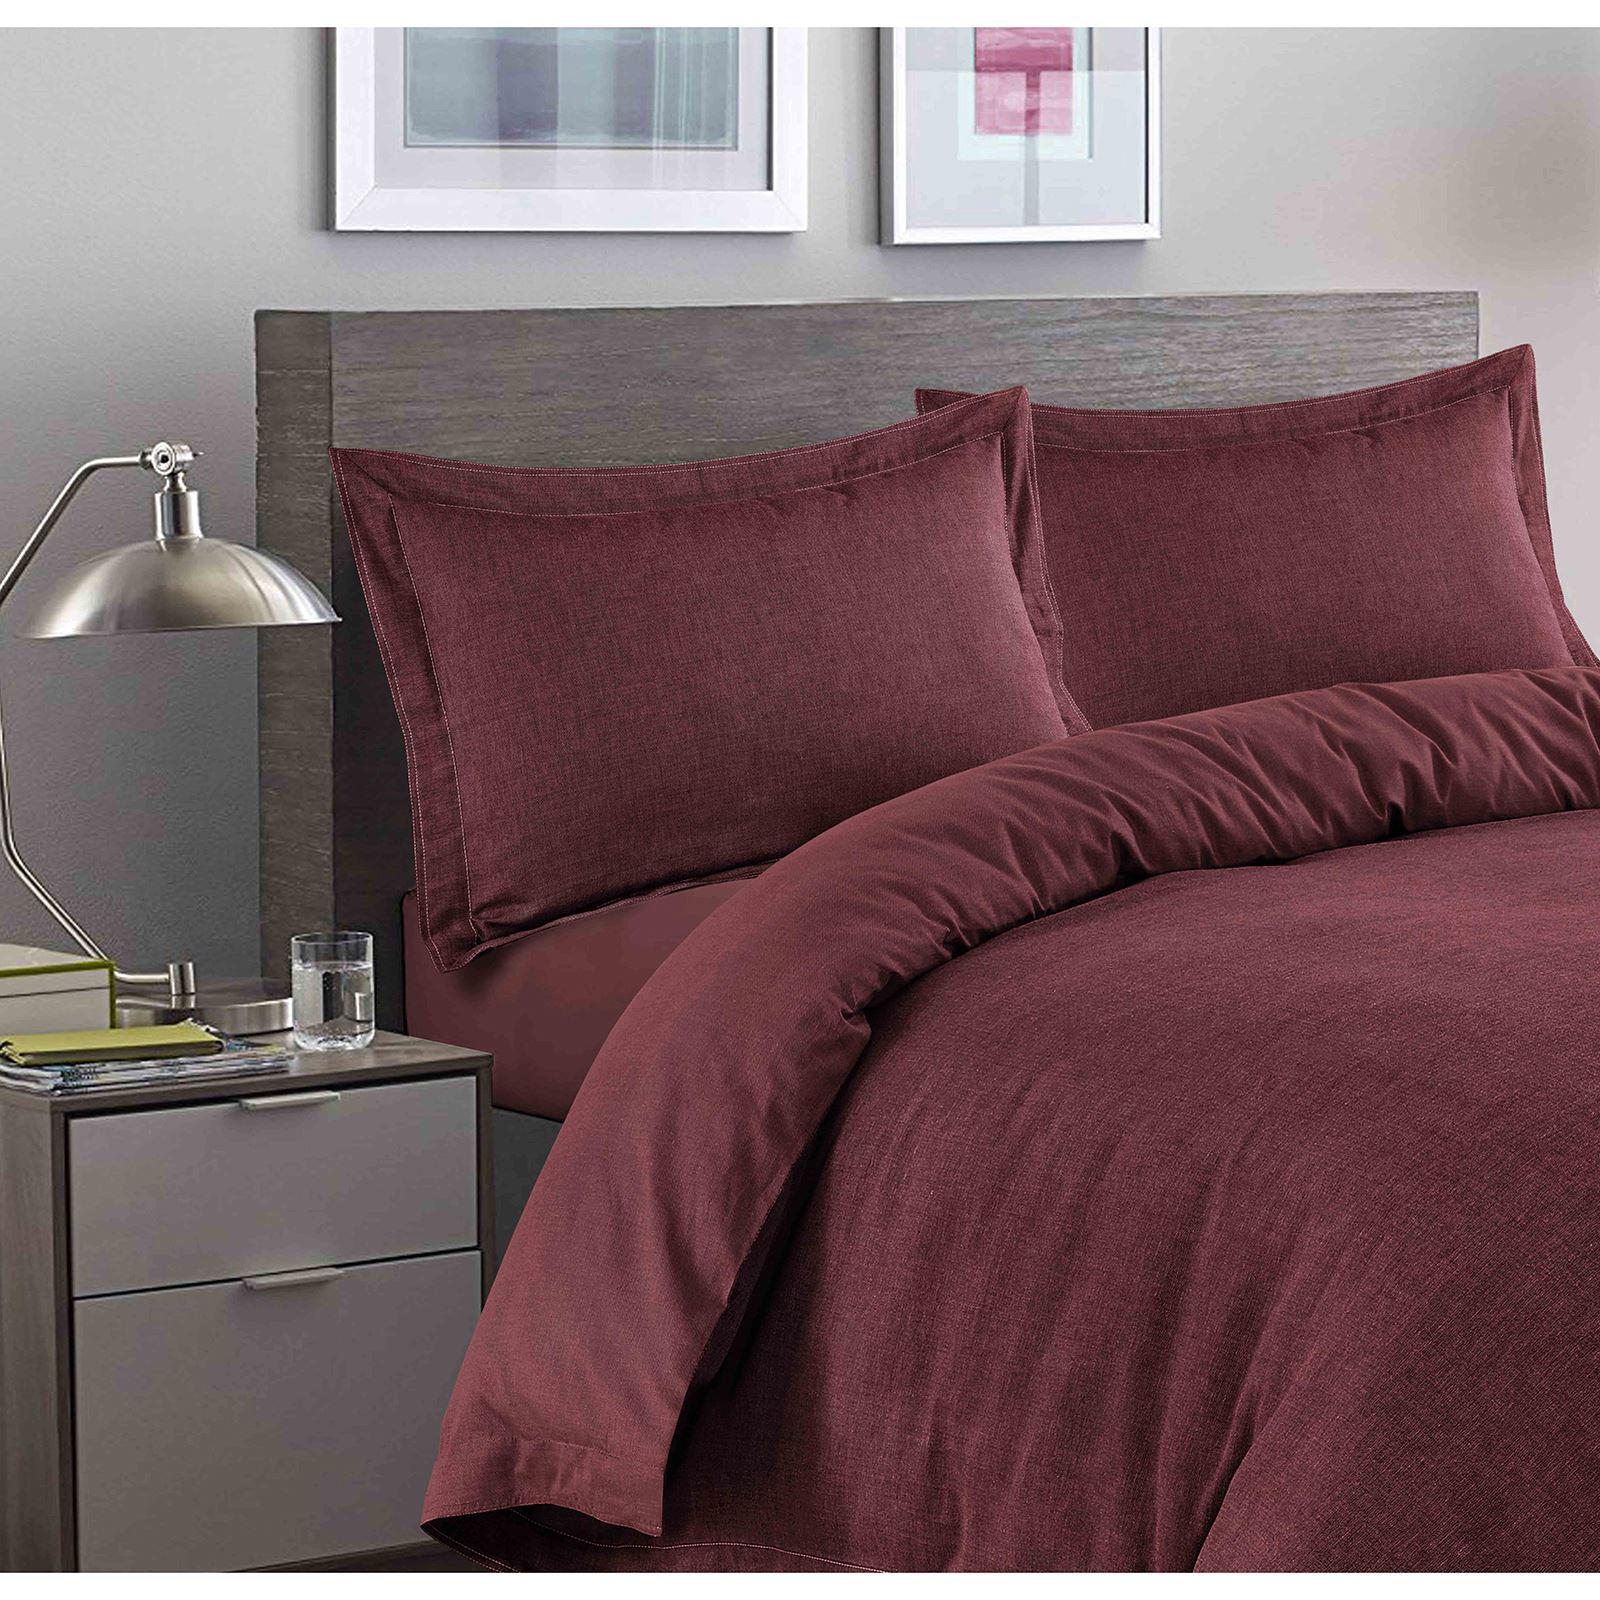 Luxury-Herringbone-Woven-100-Cotton-Duvet-Cover-Bedding-Set-Single-Double-King thumbnail 6